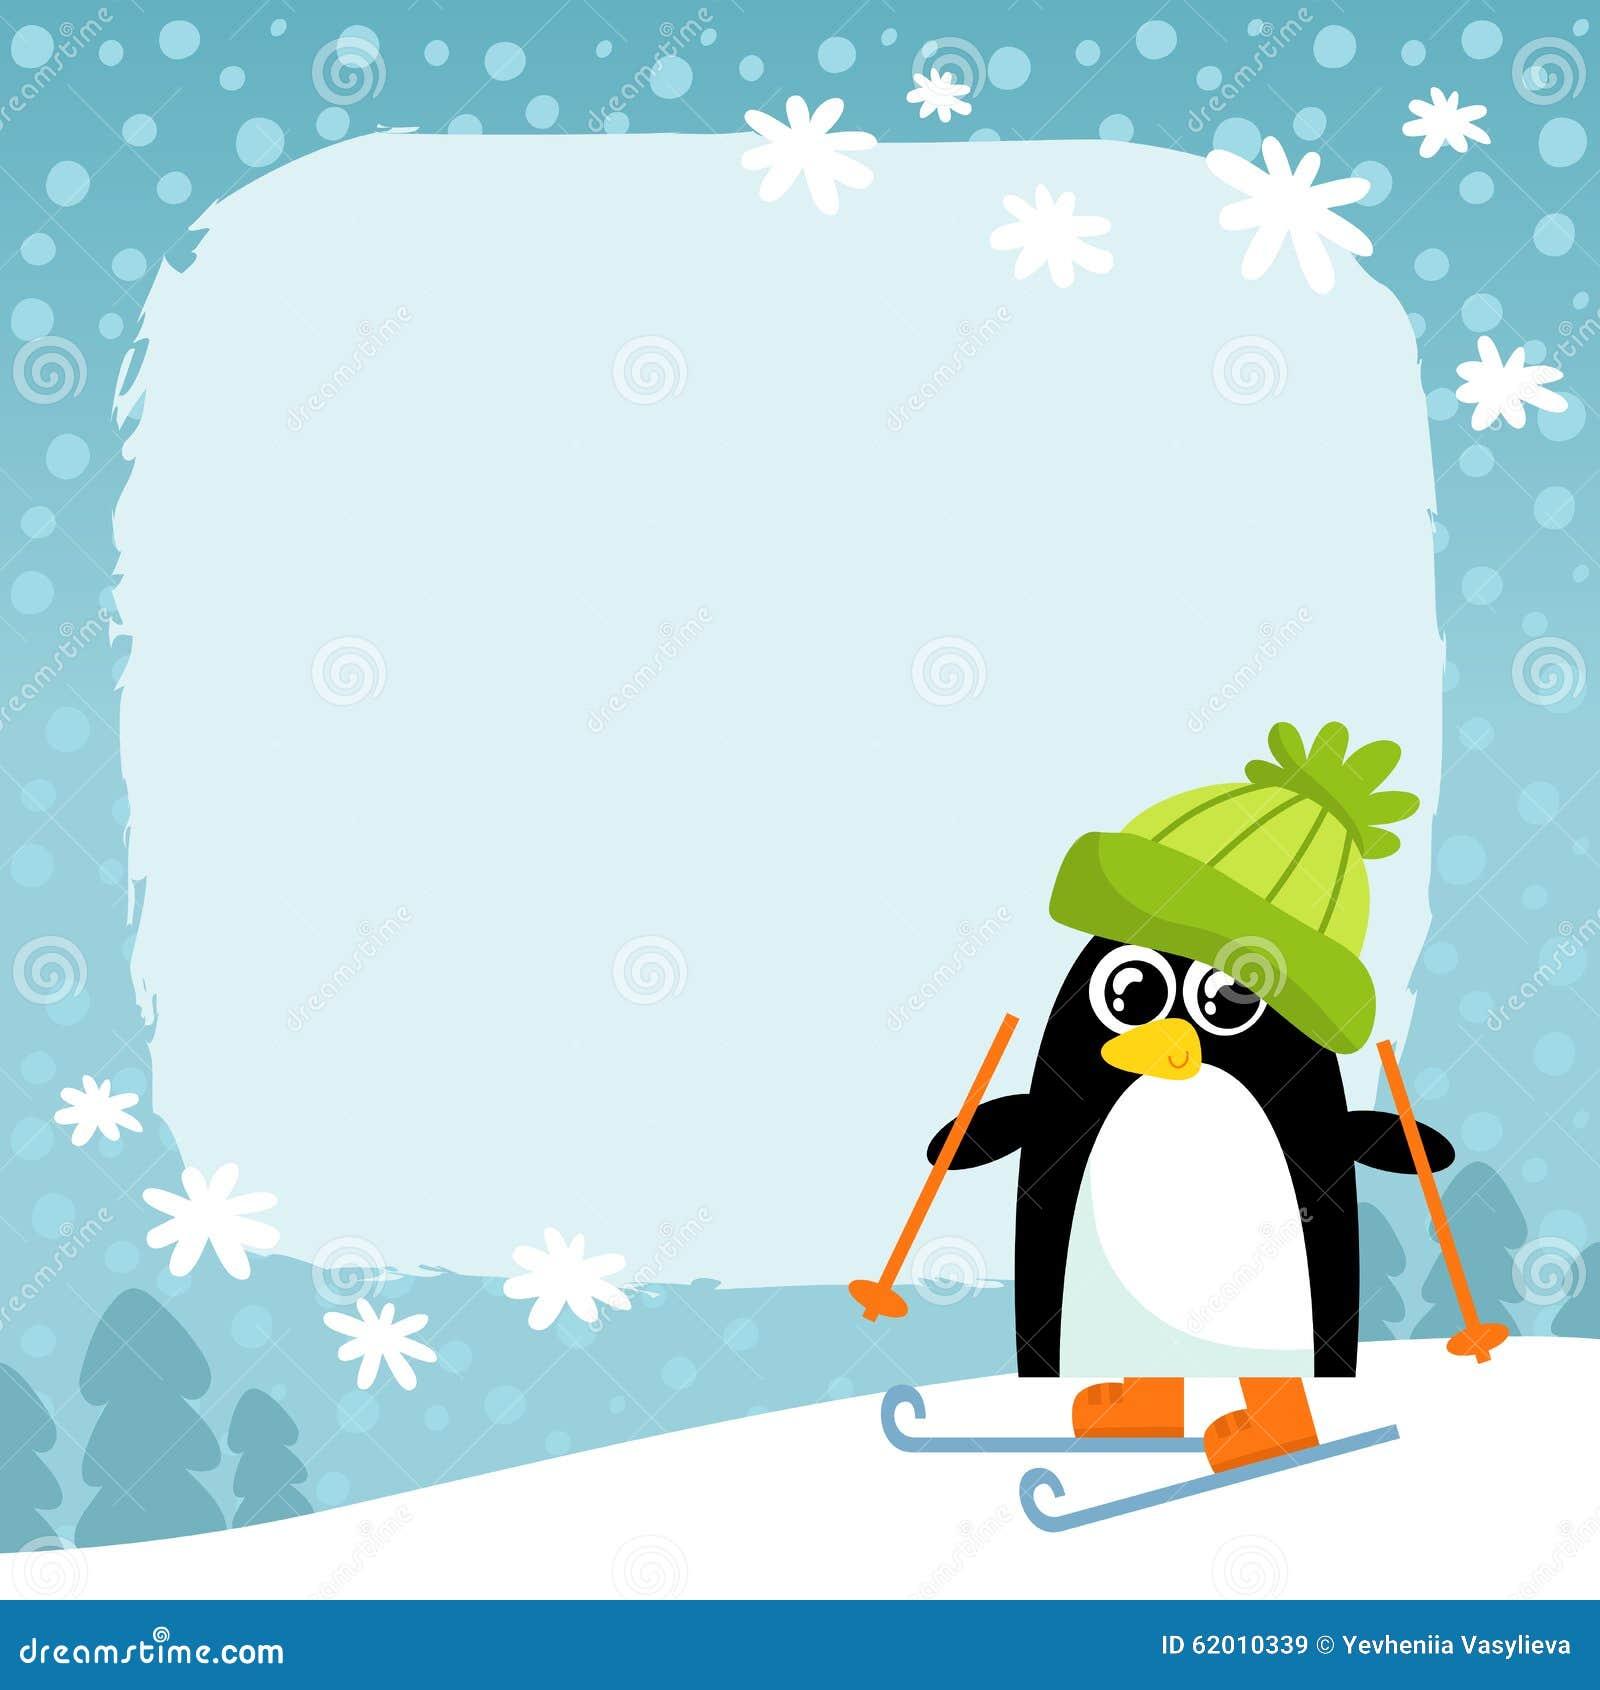 Vector penguin in green hat on winter snowy background cute cartoon